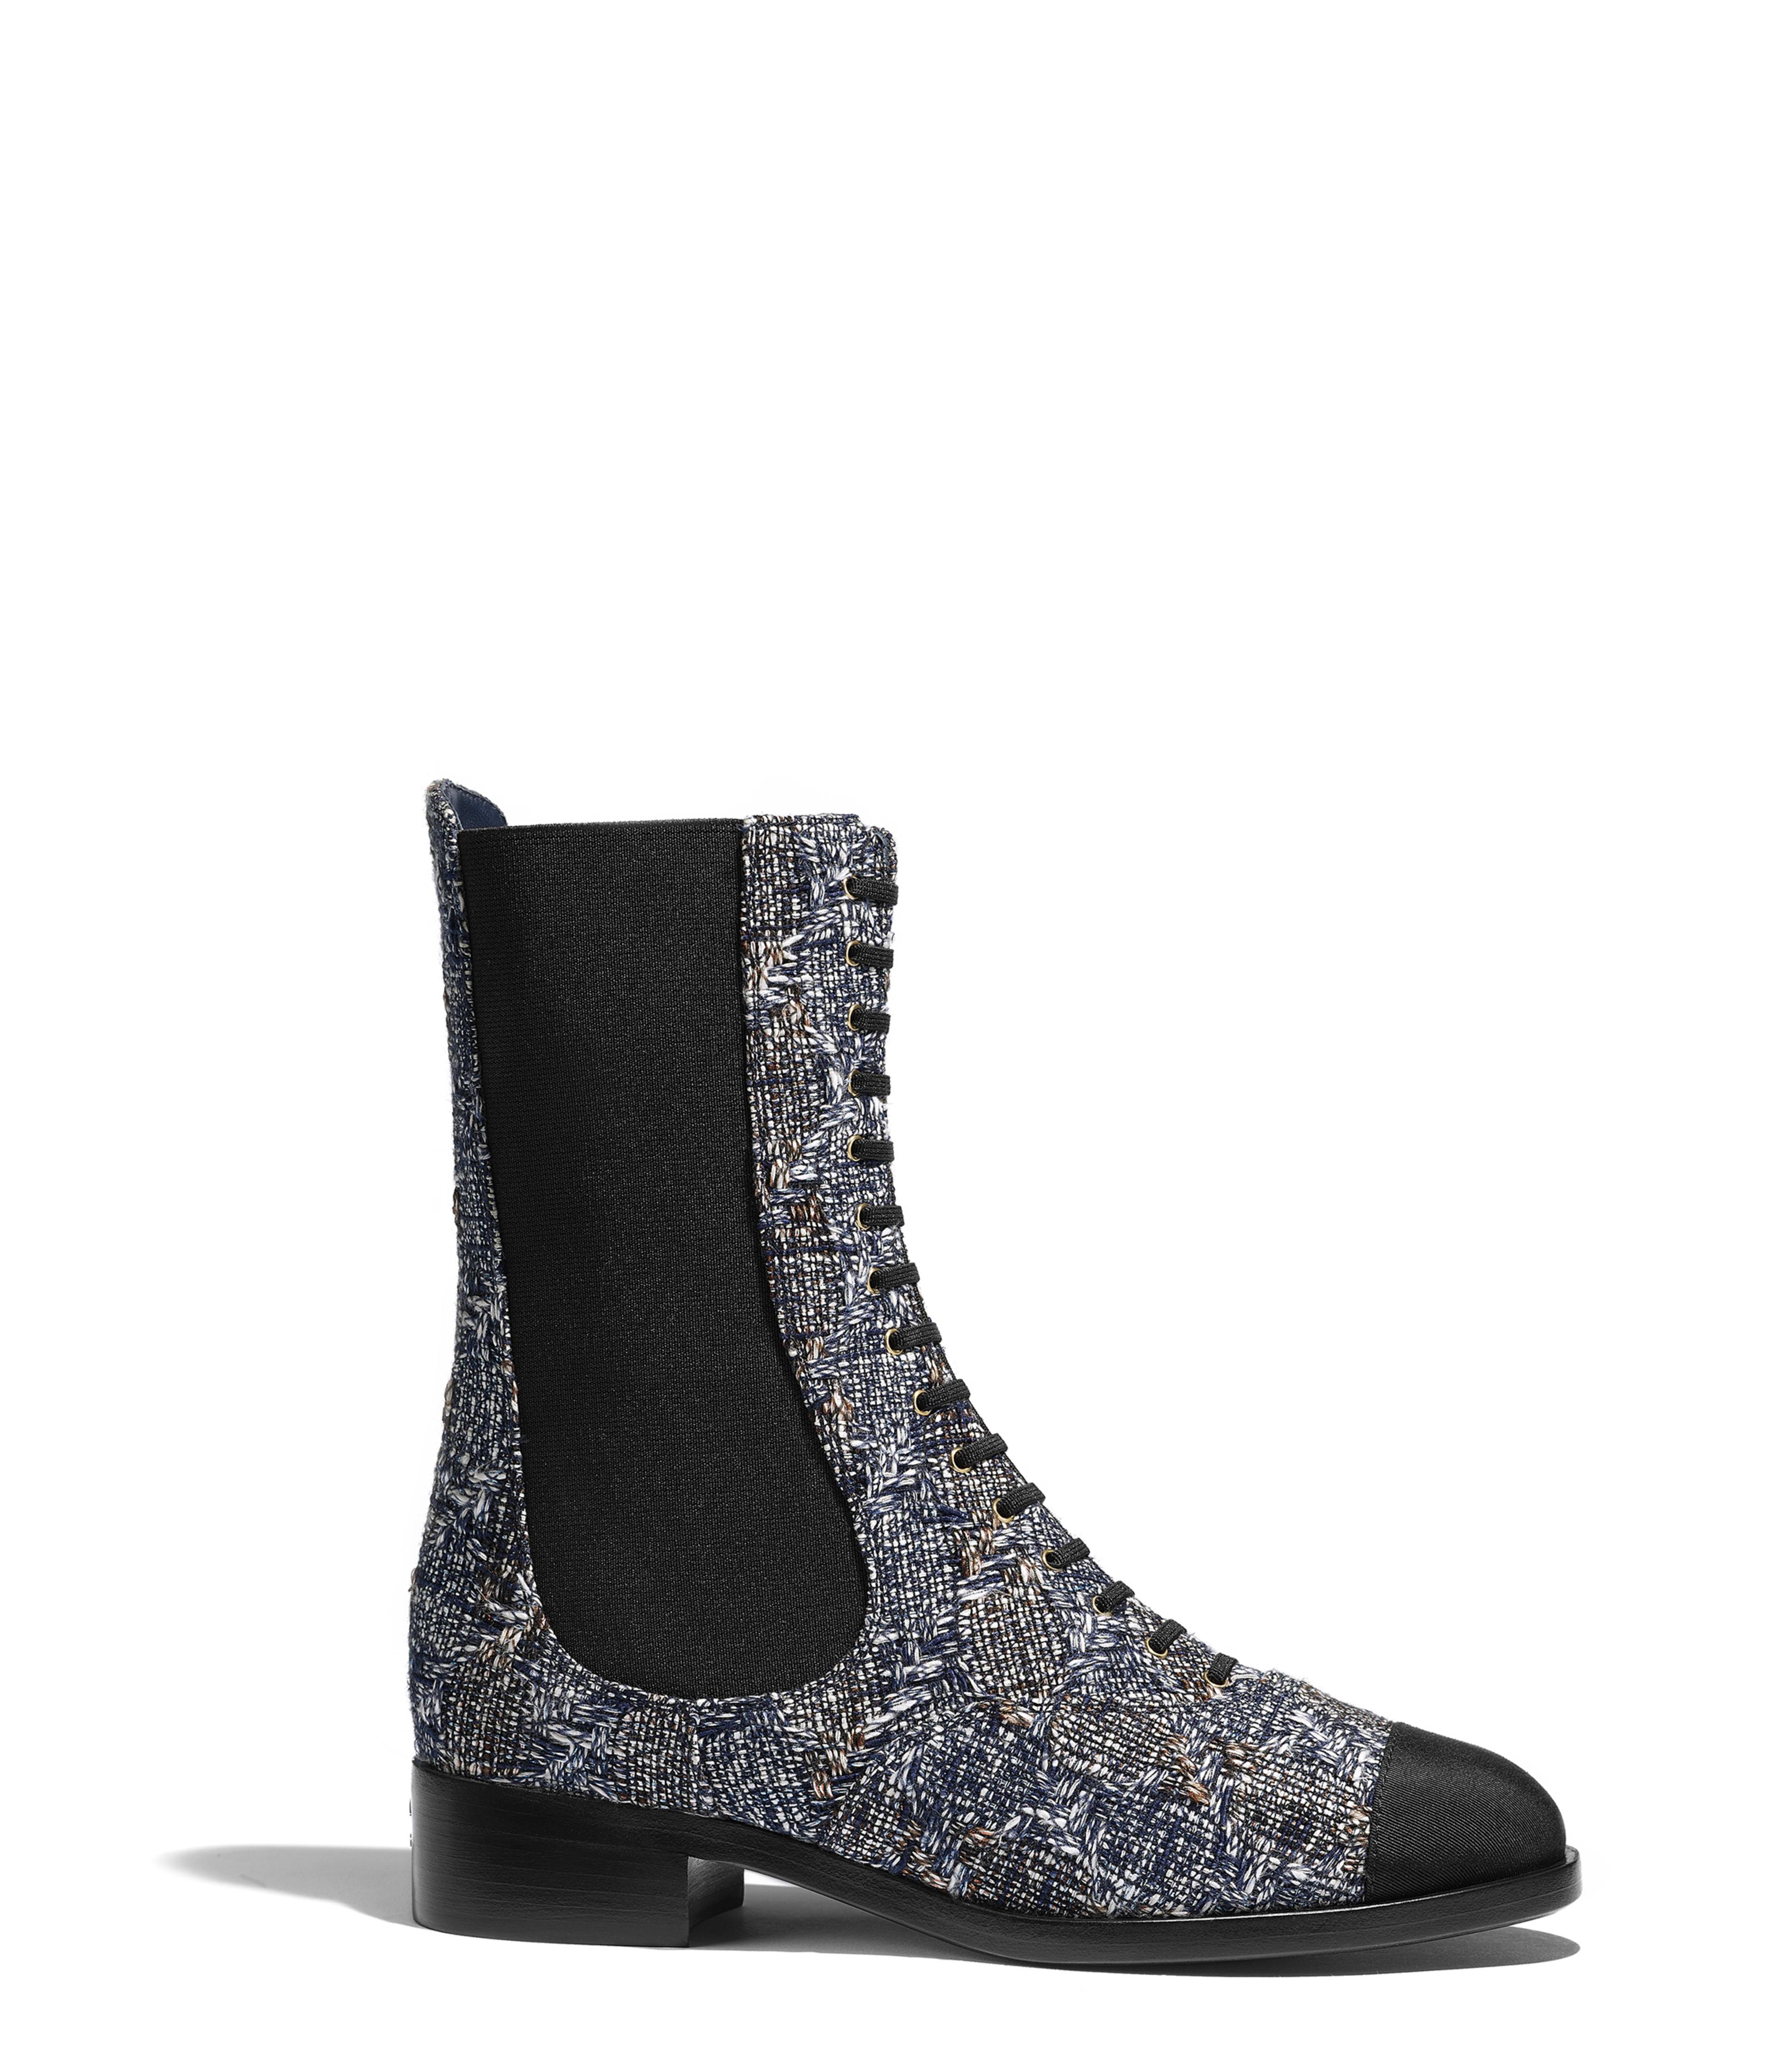 8bd8e80a230d Short Boots Tweed & Grosgrain, Gray, White & Black Ref. G34242Y52364K1238